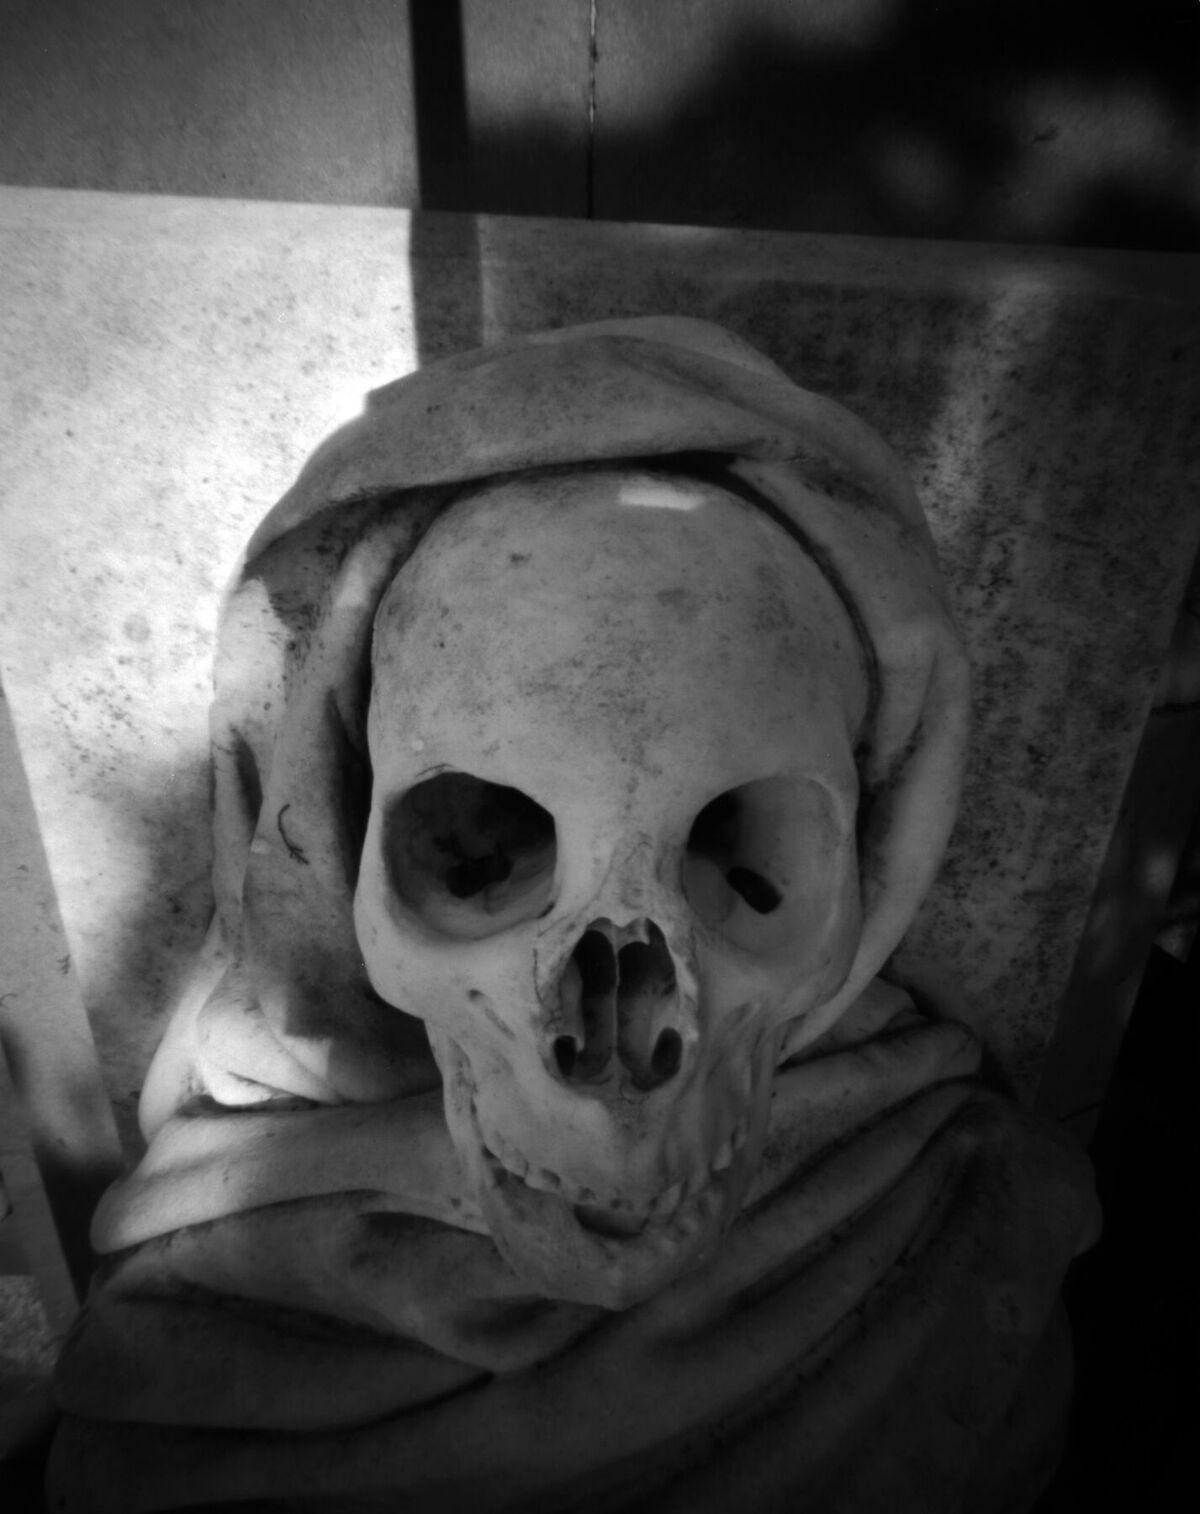 Skull  | 4x5 pinhole  | fomapan 100  | Jesús Joglar